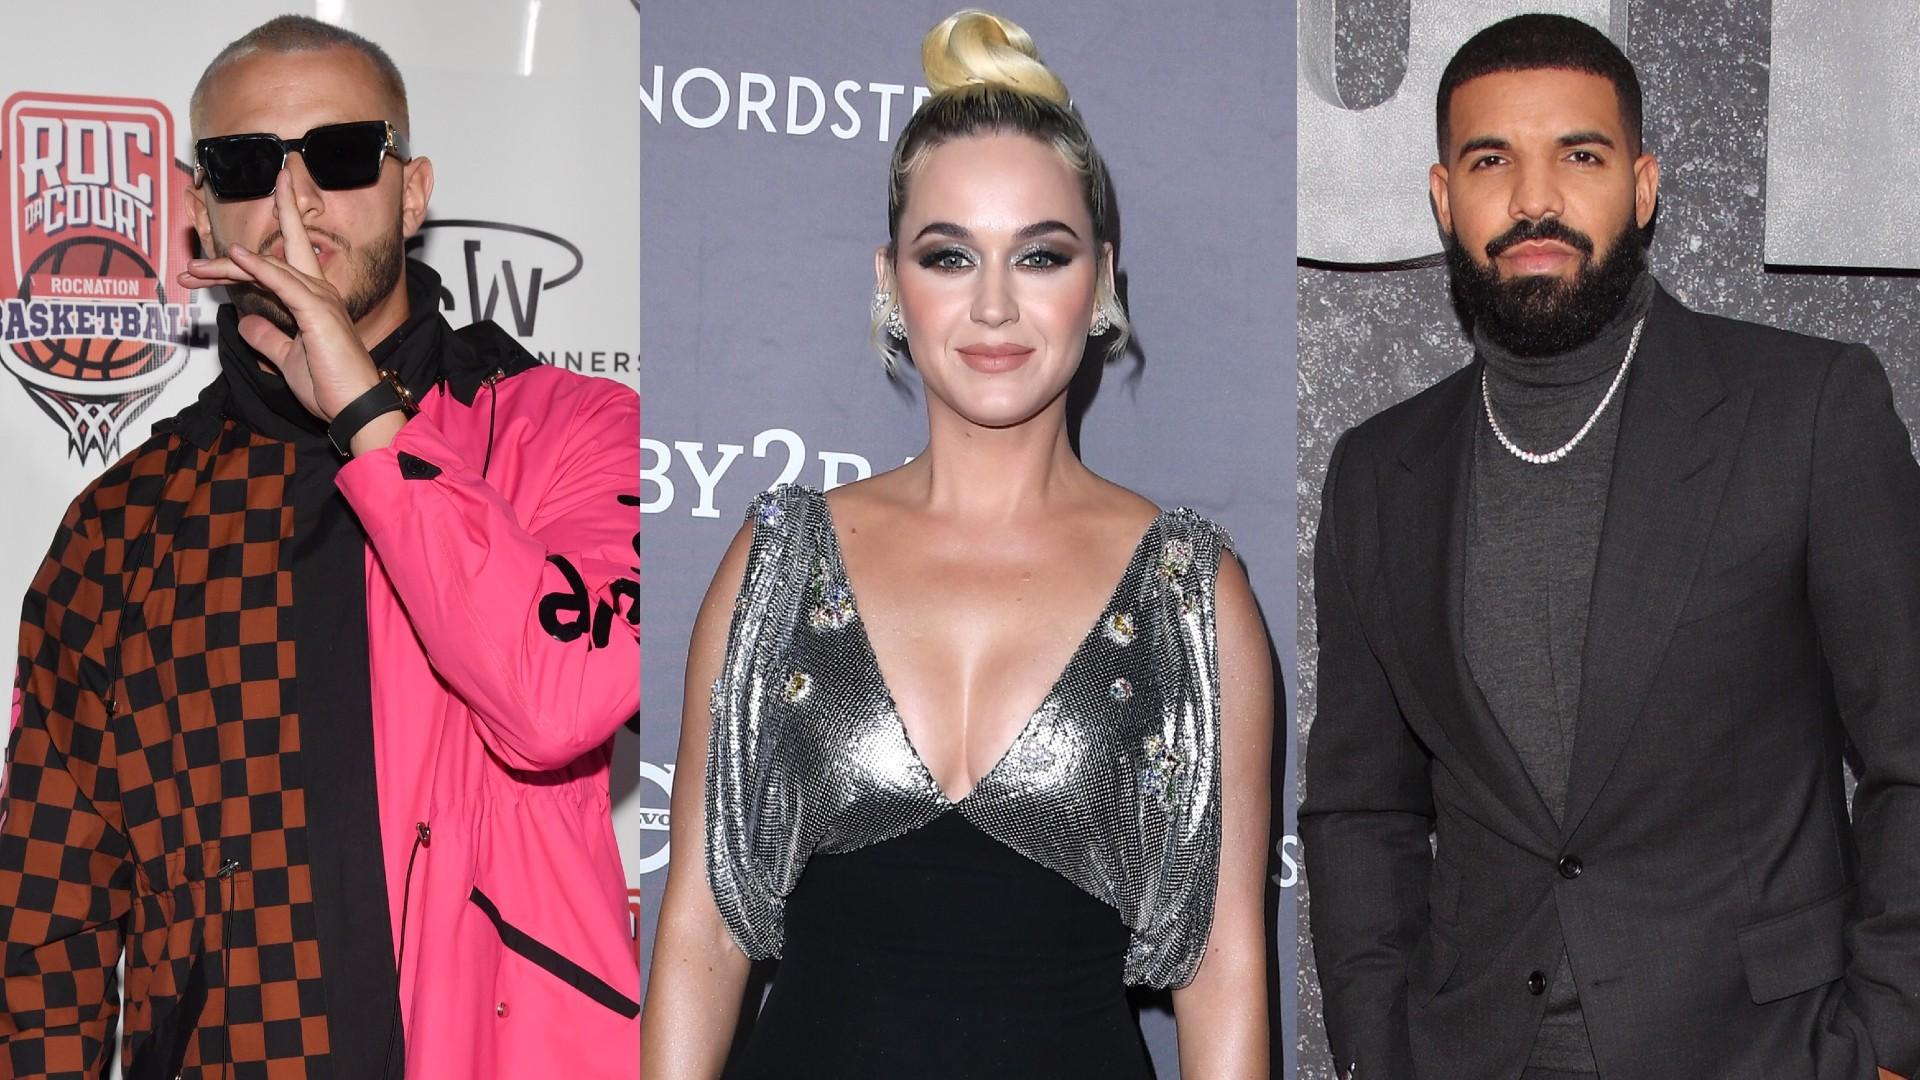 DJ Snake, Katty Perry, Drake